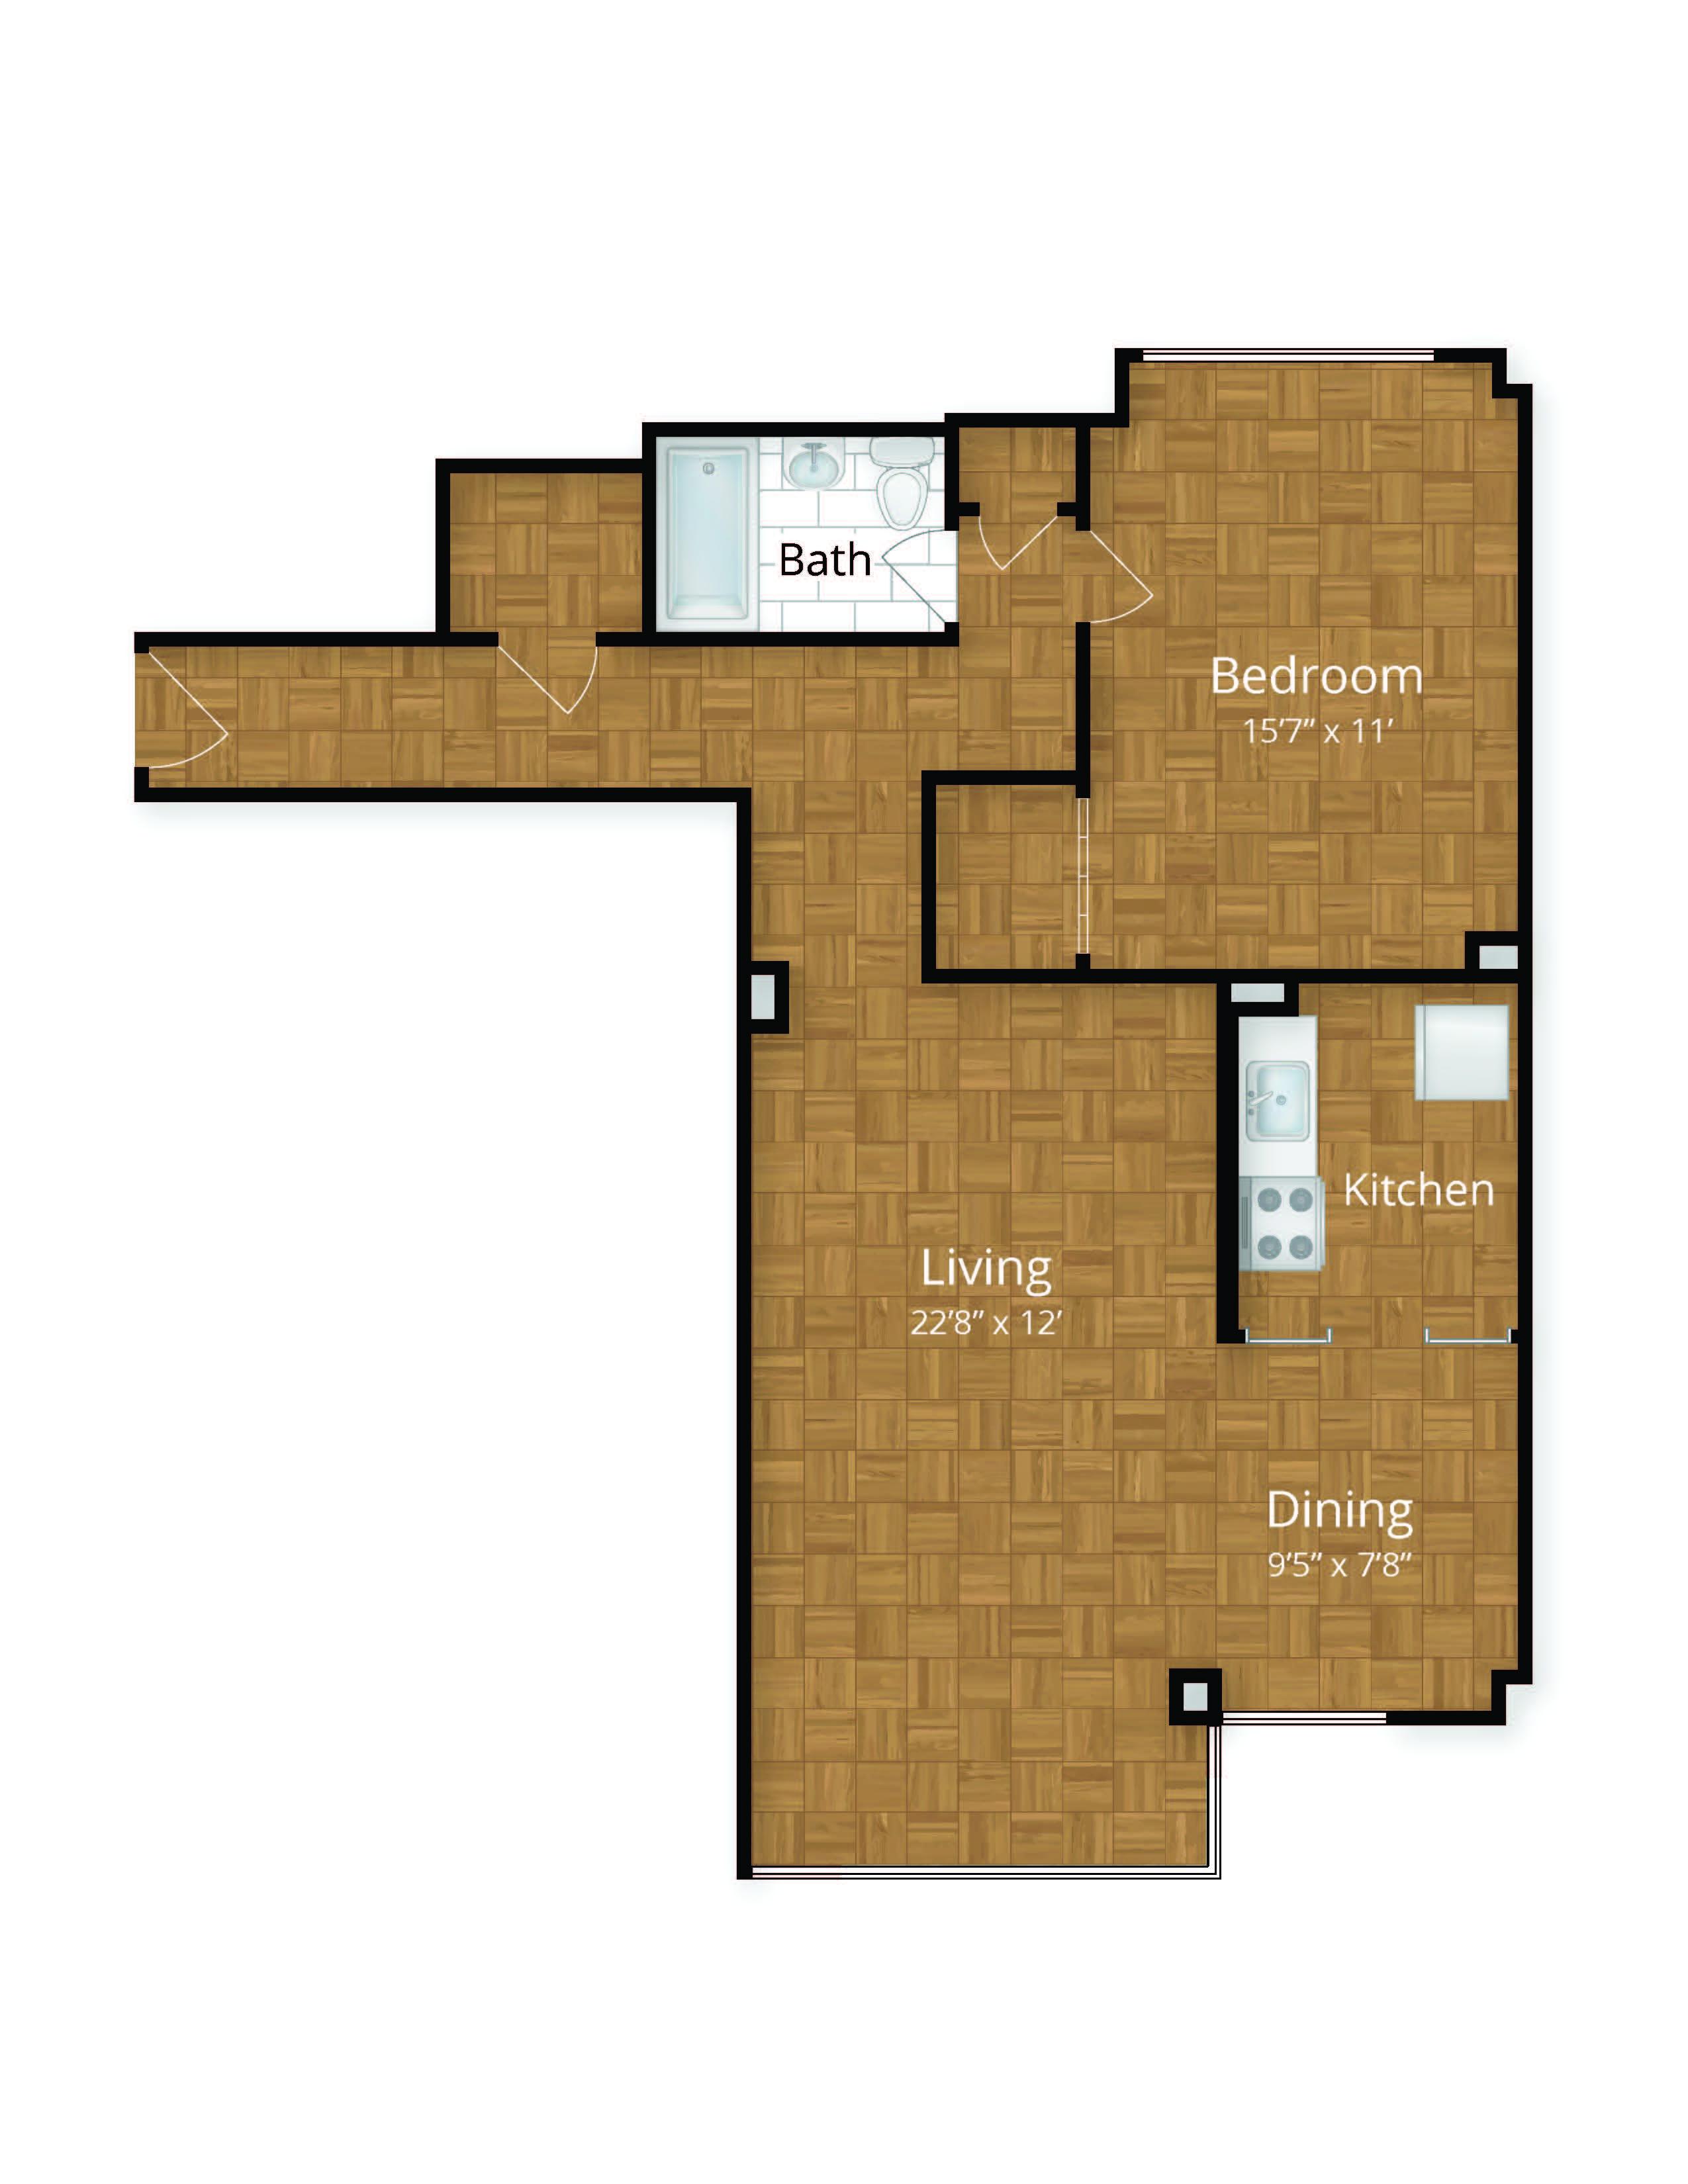 Potomac Park Apartments Large One Bedroom Floor Plan Foggy Bottom  Washington DC